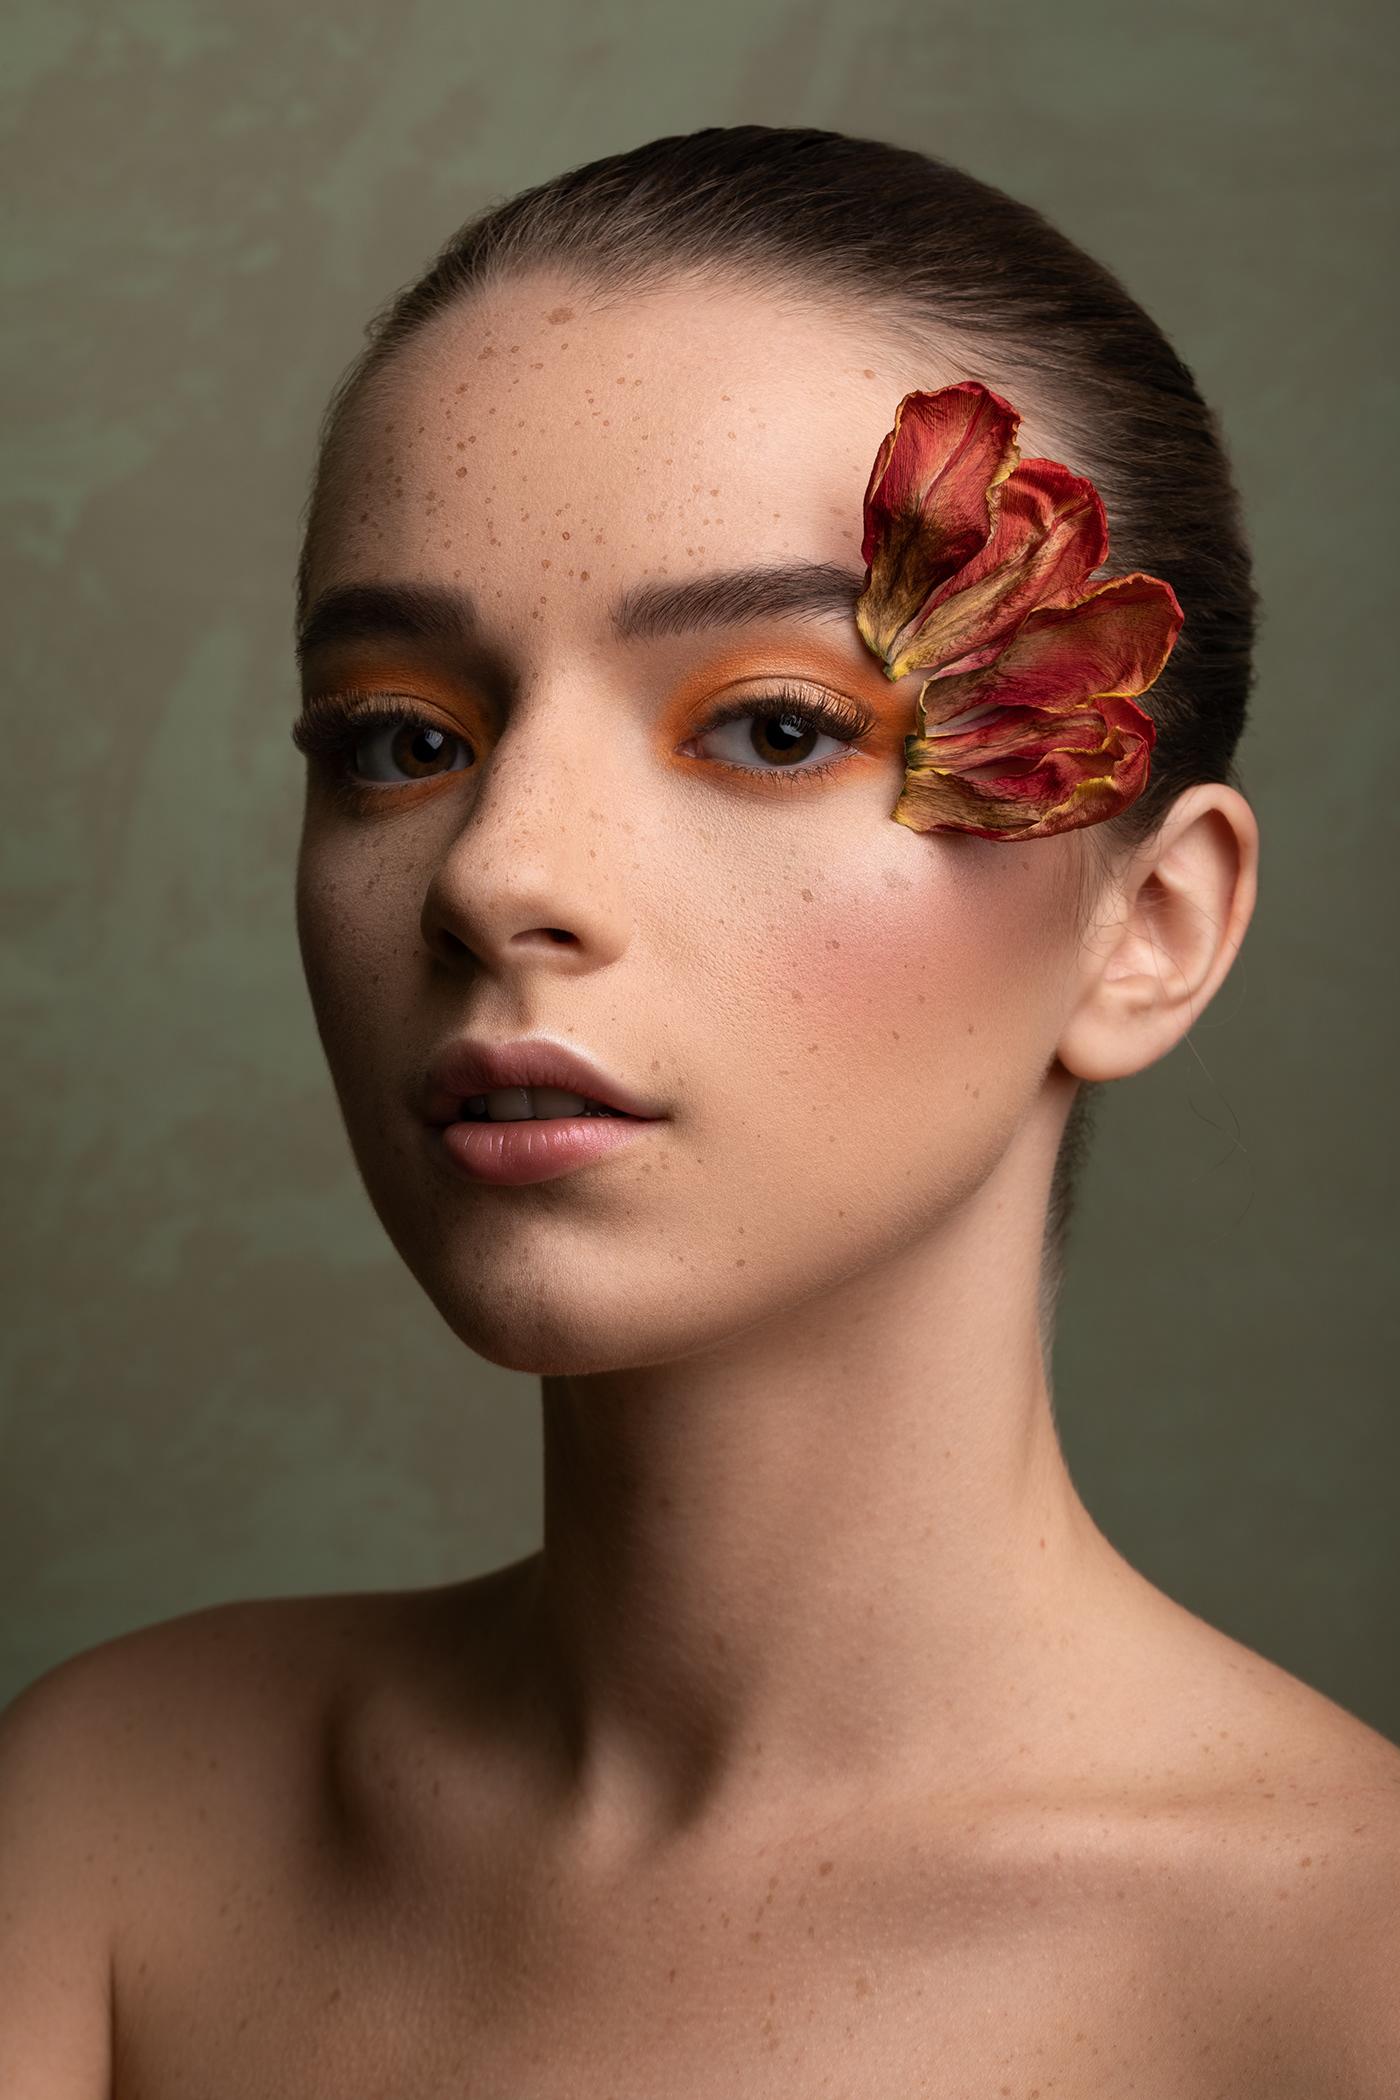 beauty edit Fashion  FINEART light makeup model Photography  portrait retouch